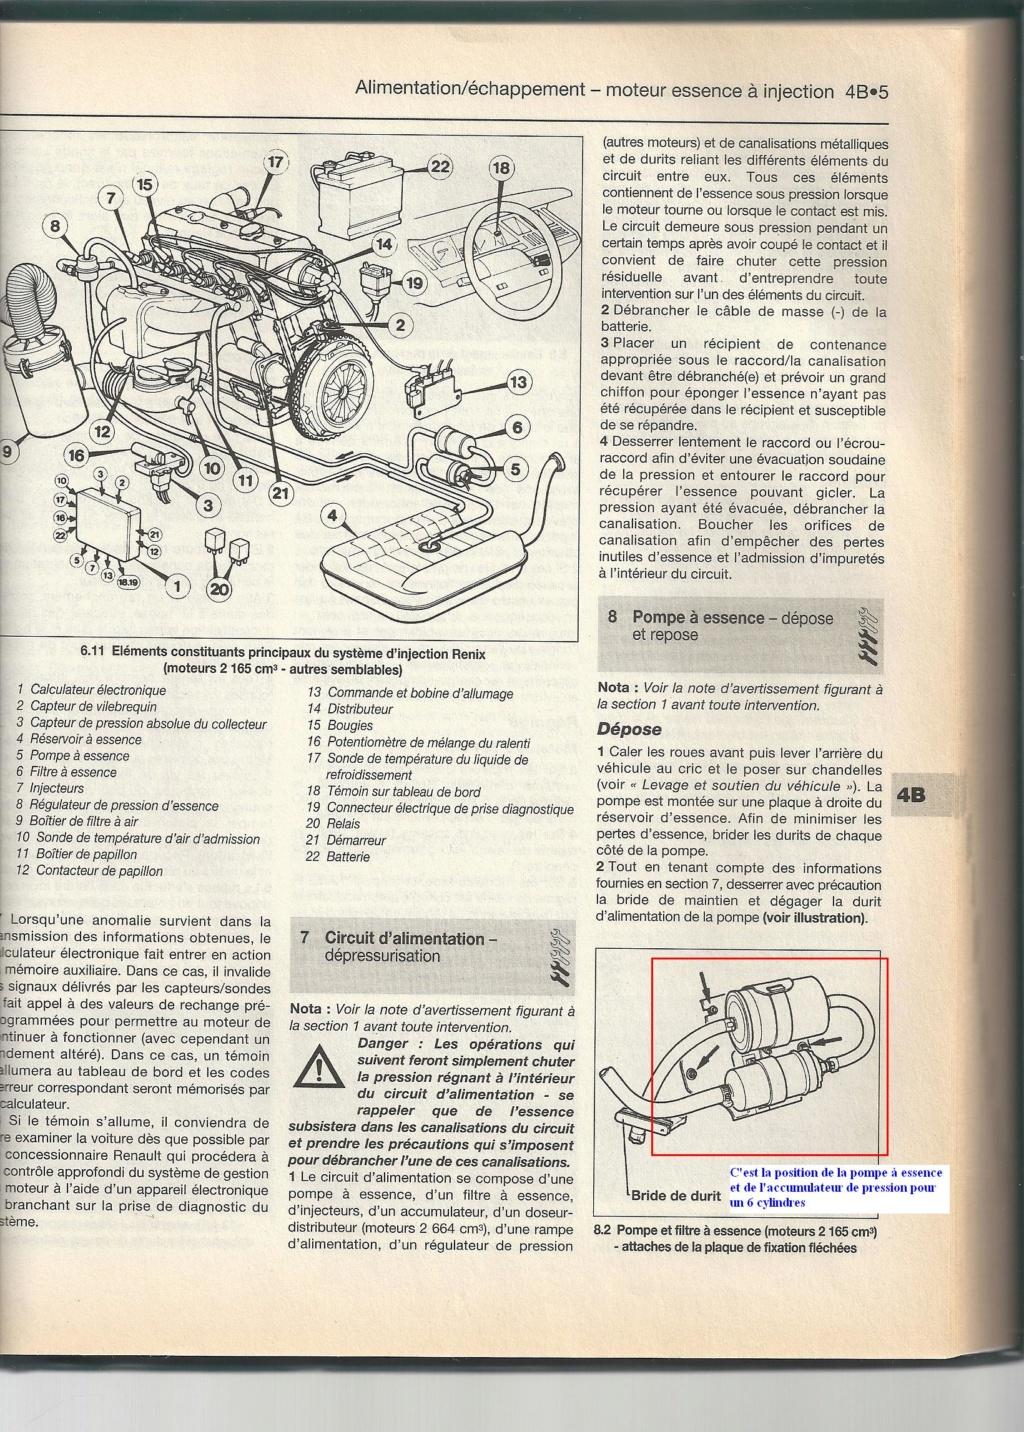 Renault 25 v6 turbo de 1987 Numzor14